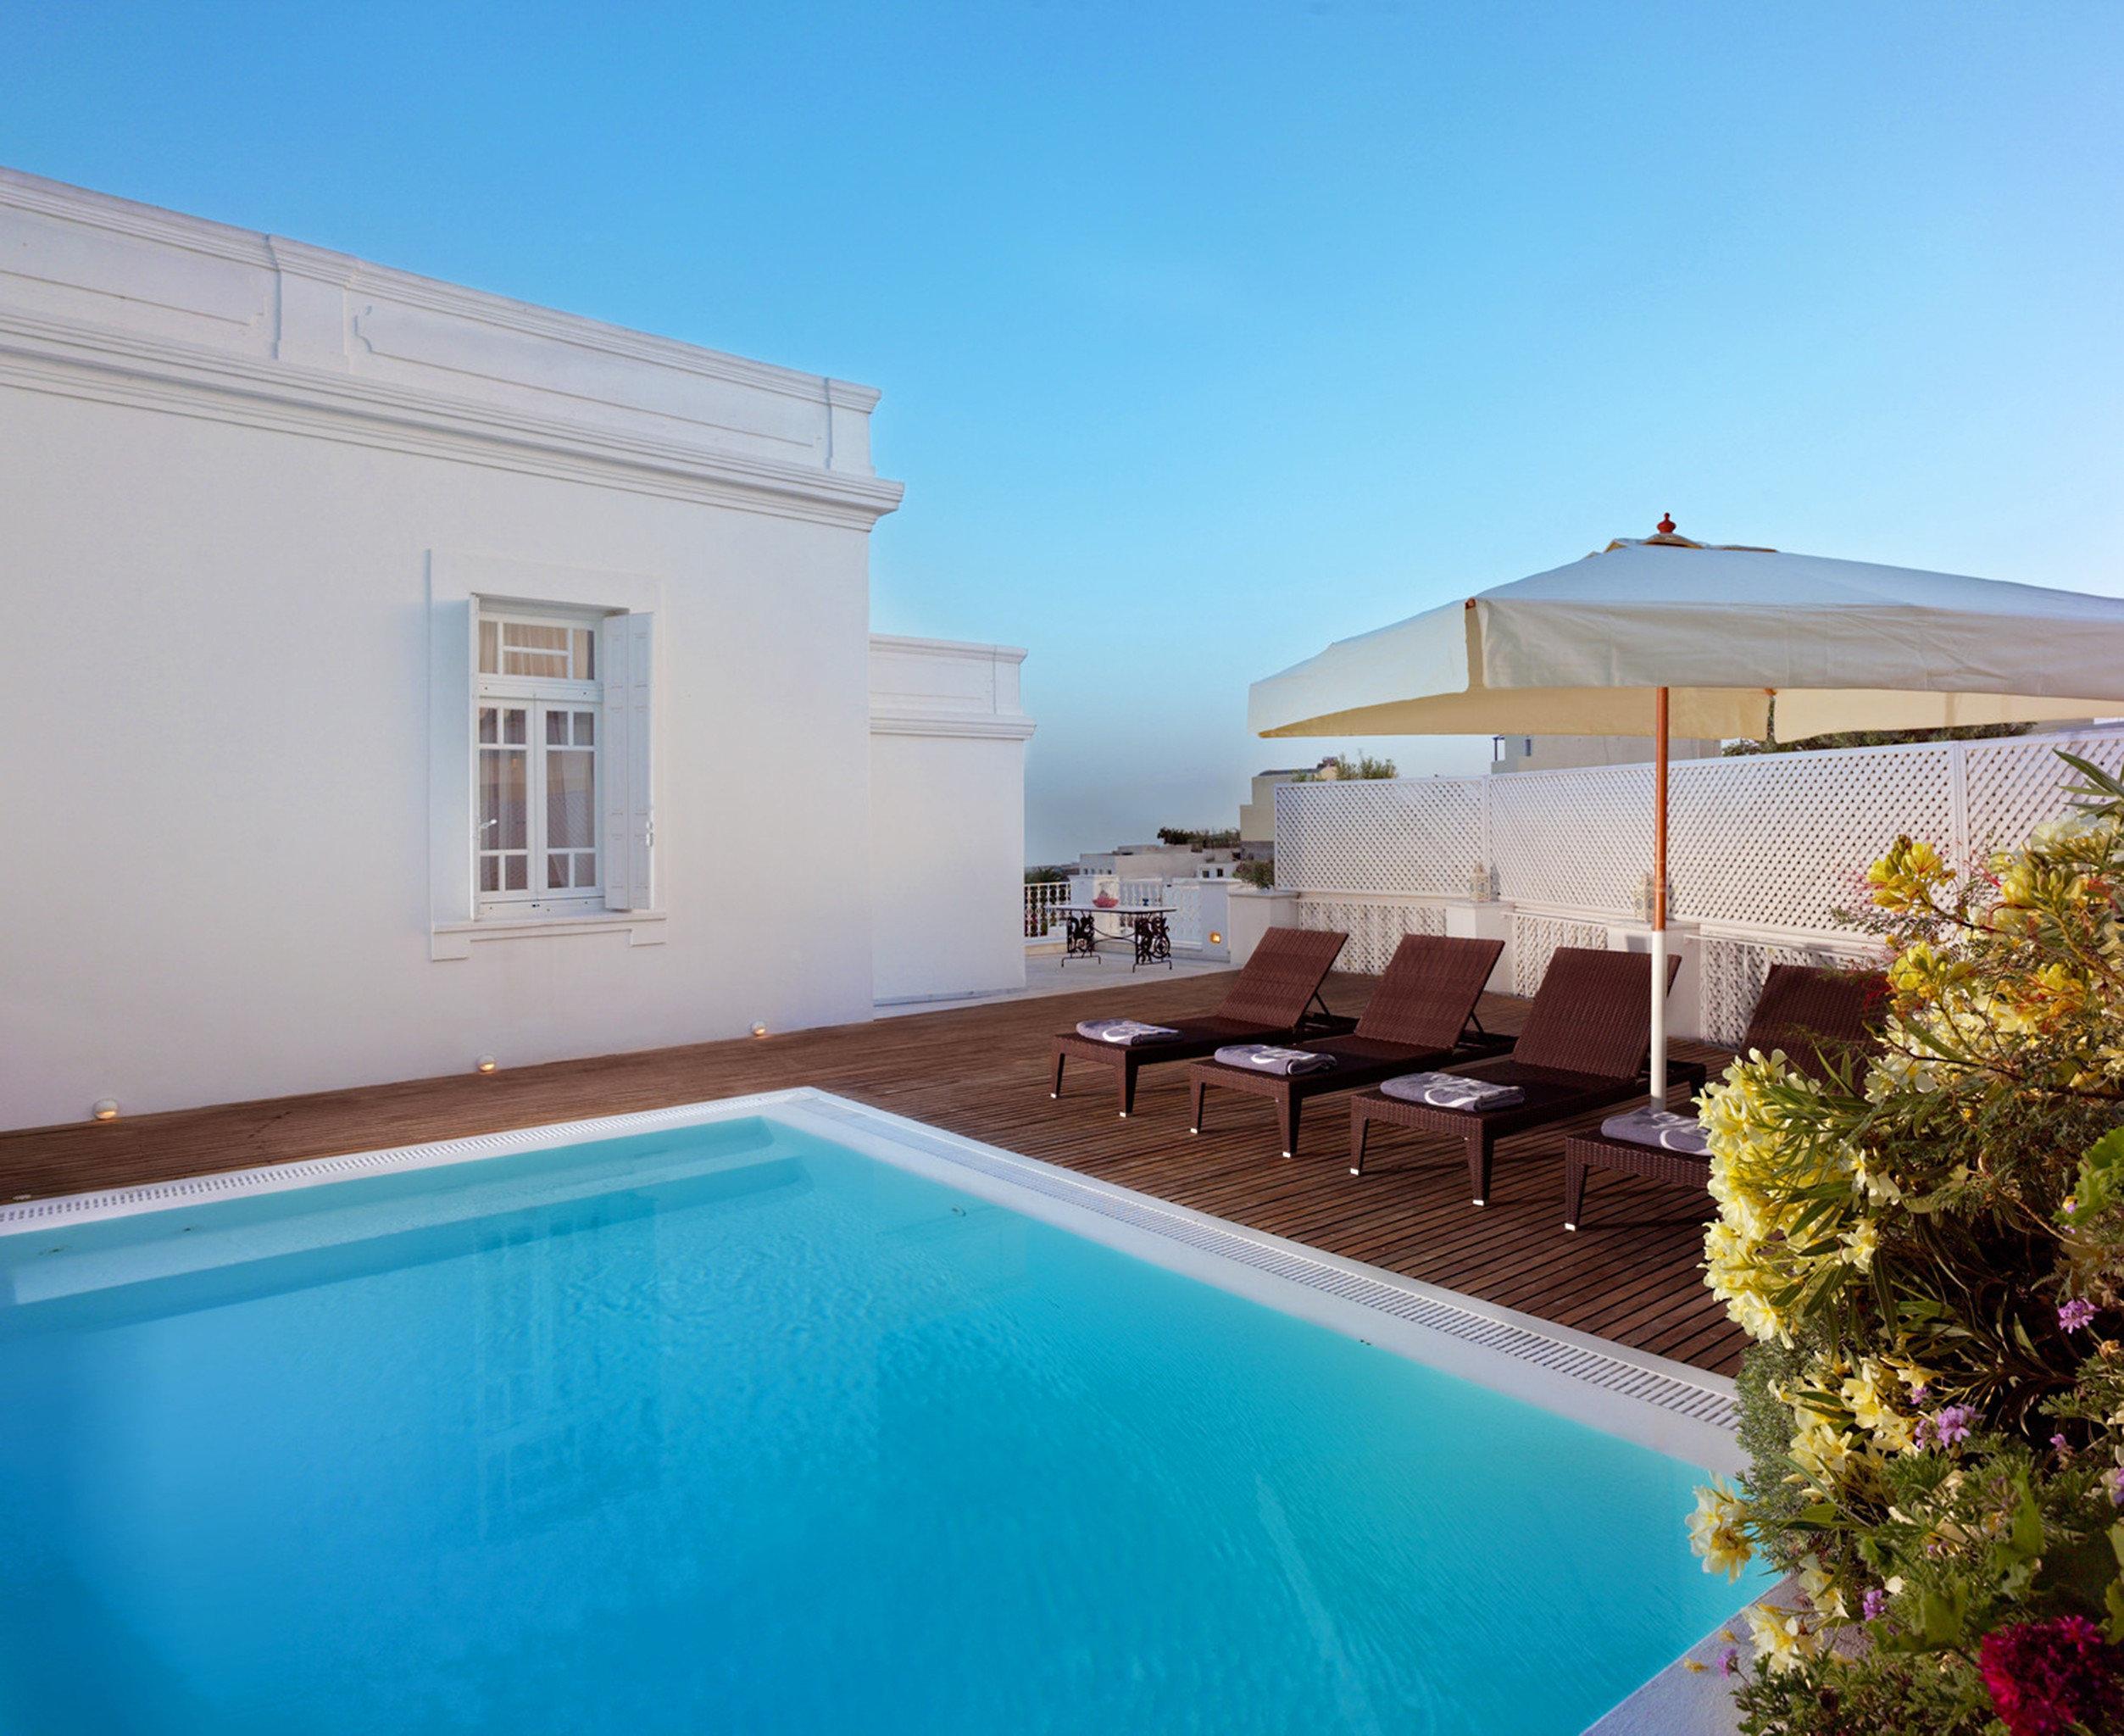 Lounge Modern Pool sky swimming pool property house Villa building home Resort hacienda cottage condominium backyard mansion